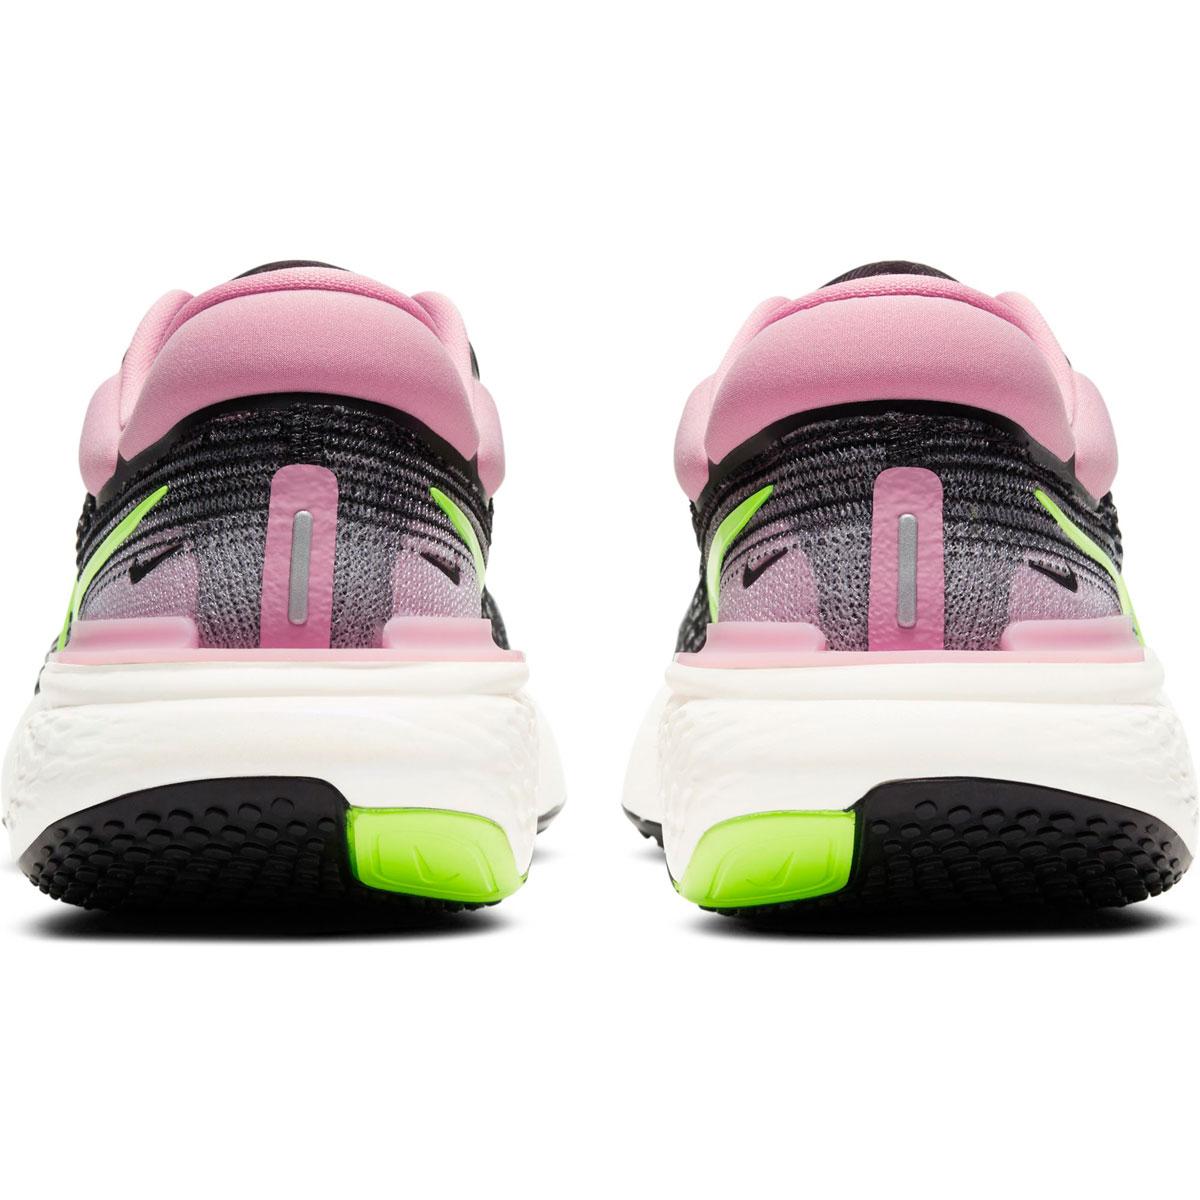 Women's Nike Zoomx Invincible Run FlyKnit Running Shoe - Color: Black/Cyber/Elemental Pink - Size: 6 - Width: Regular, Black/Cyber/Elemental Pink, large, image 5